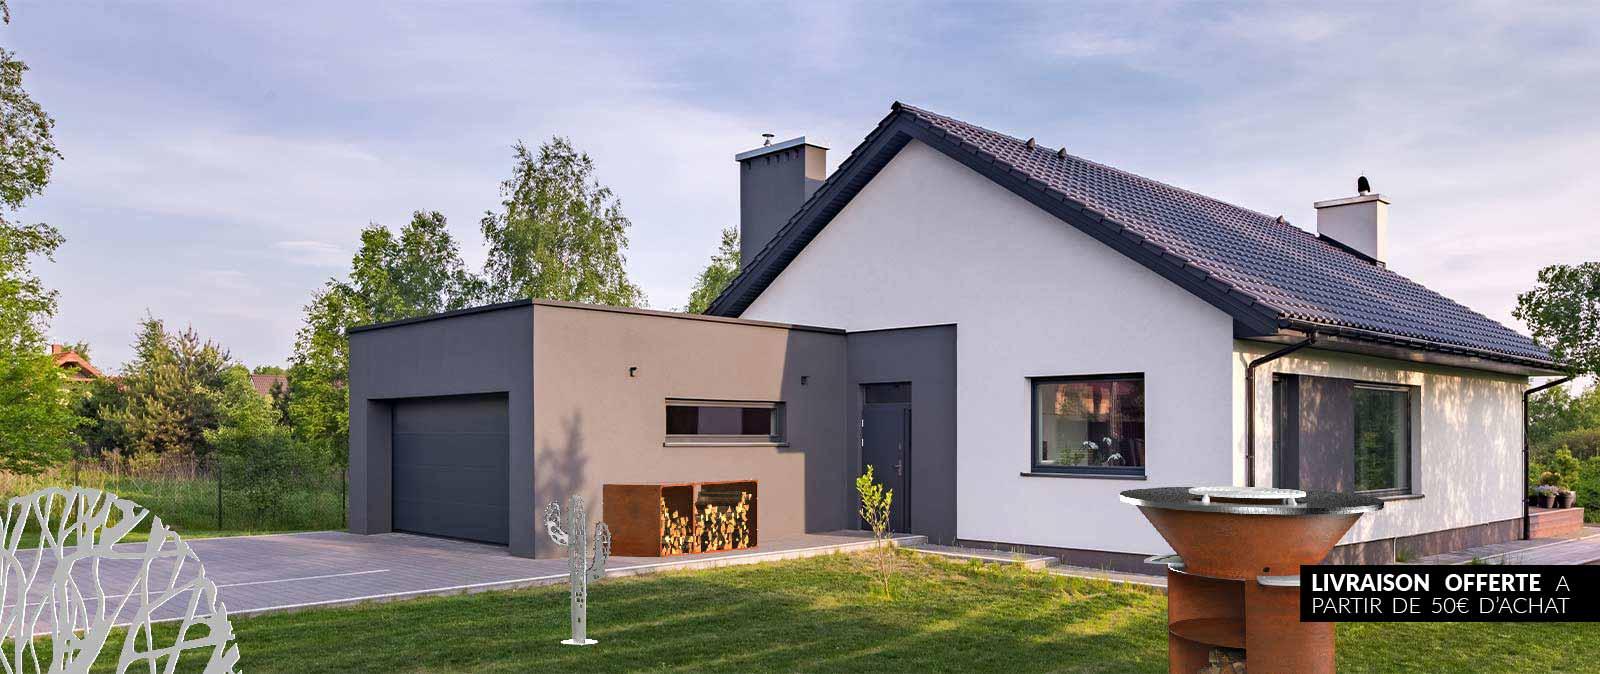 Home_14_Livraison_offerte_50€